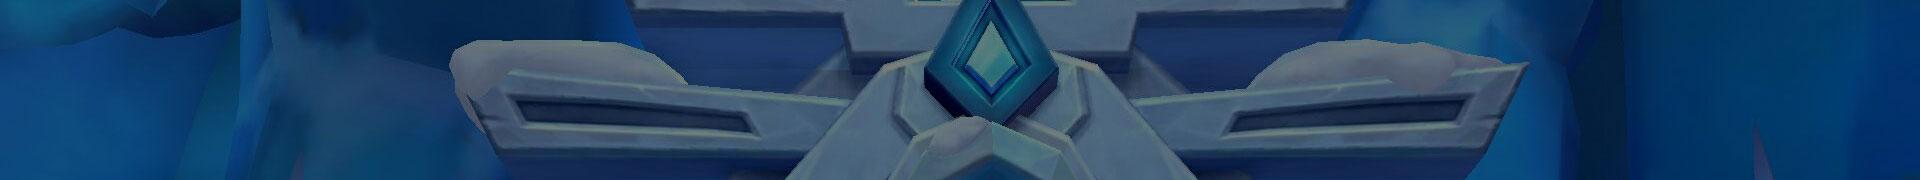 Ragnarok M: Eternal Love Zeny Top Up & Boosting